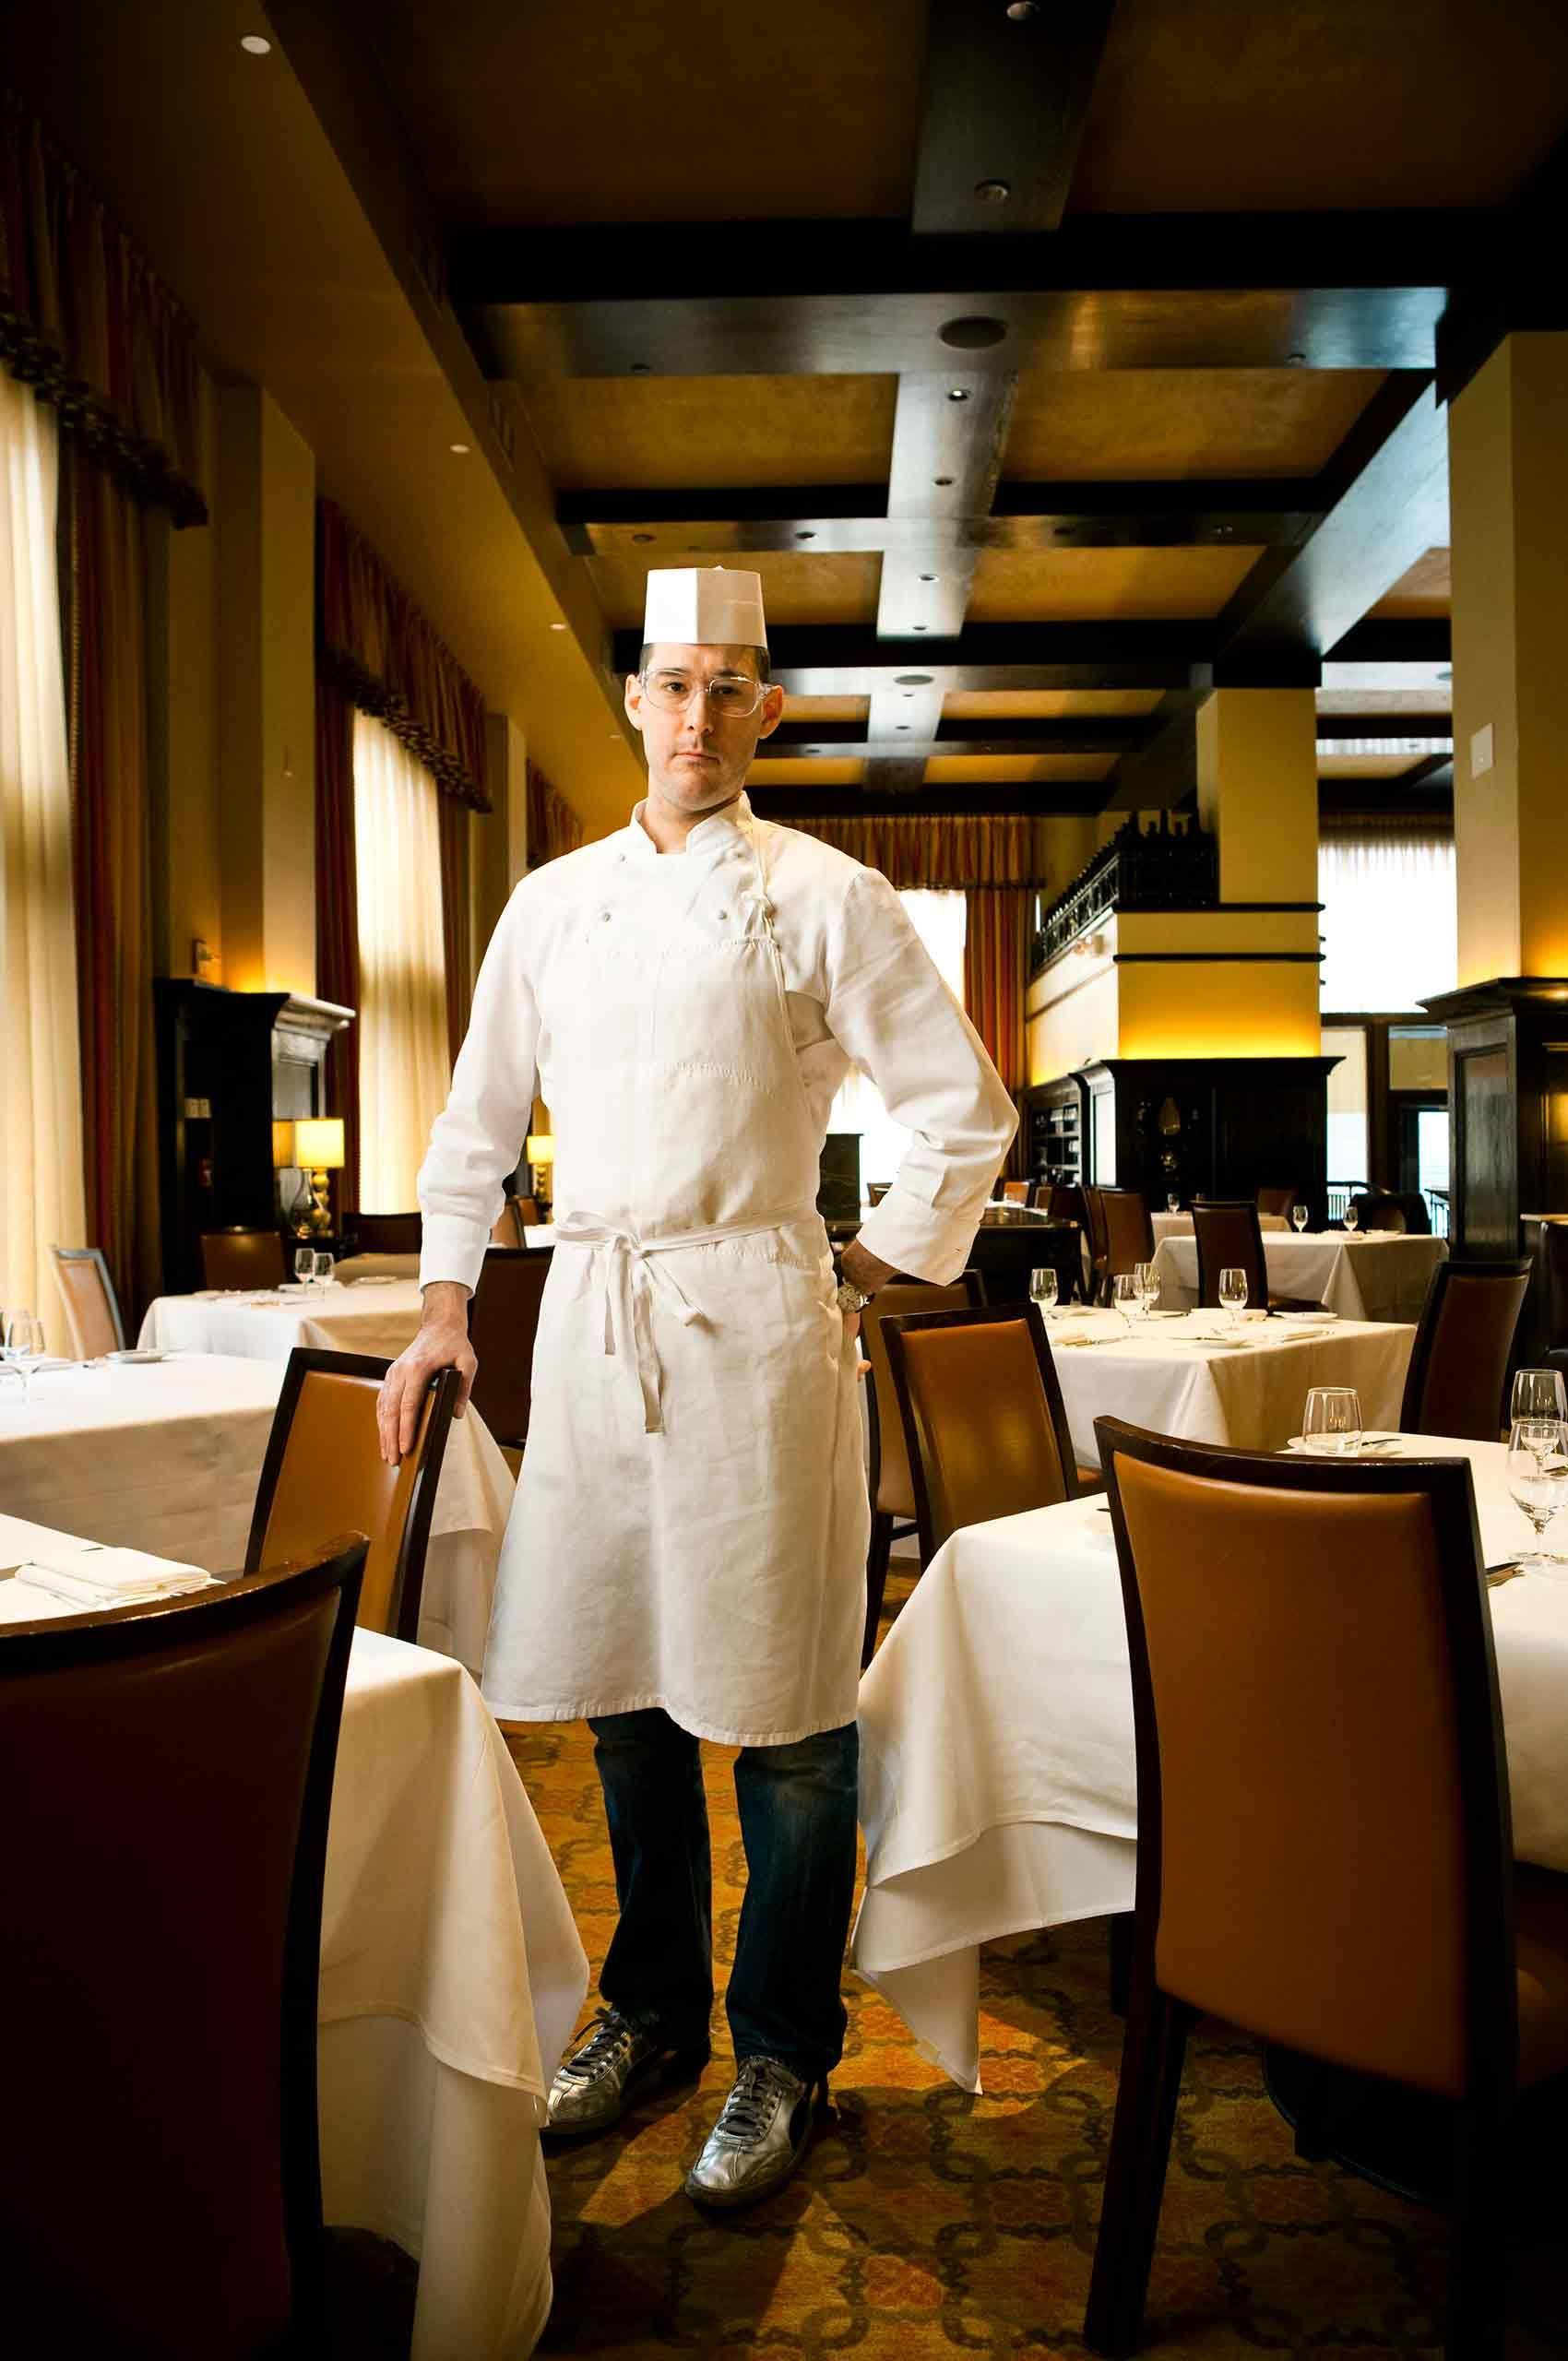 DelPosto-Chef-in-Silversneakers-by-HenrikOlundPhotography.jpg